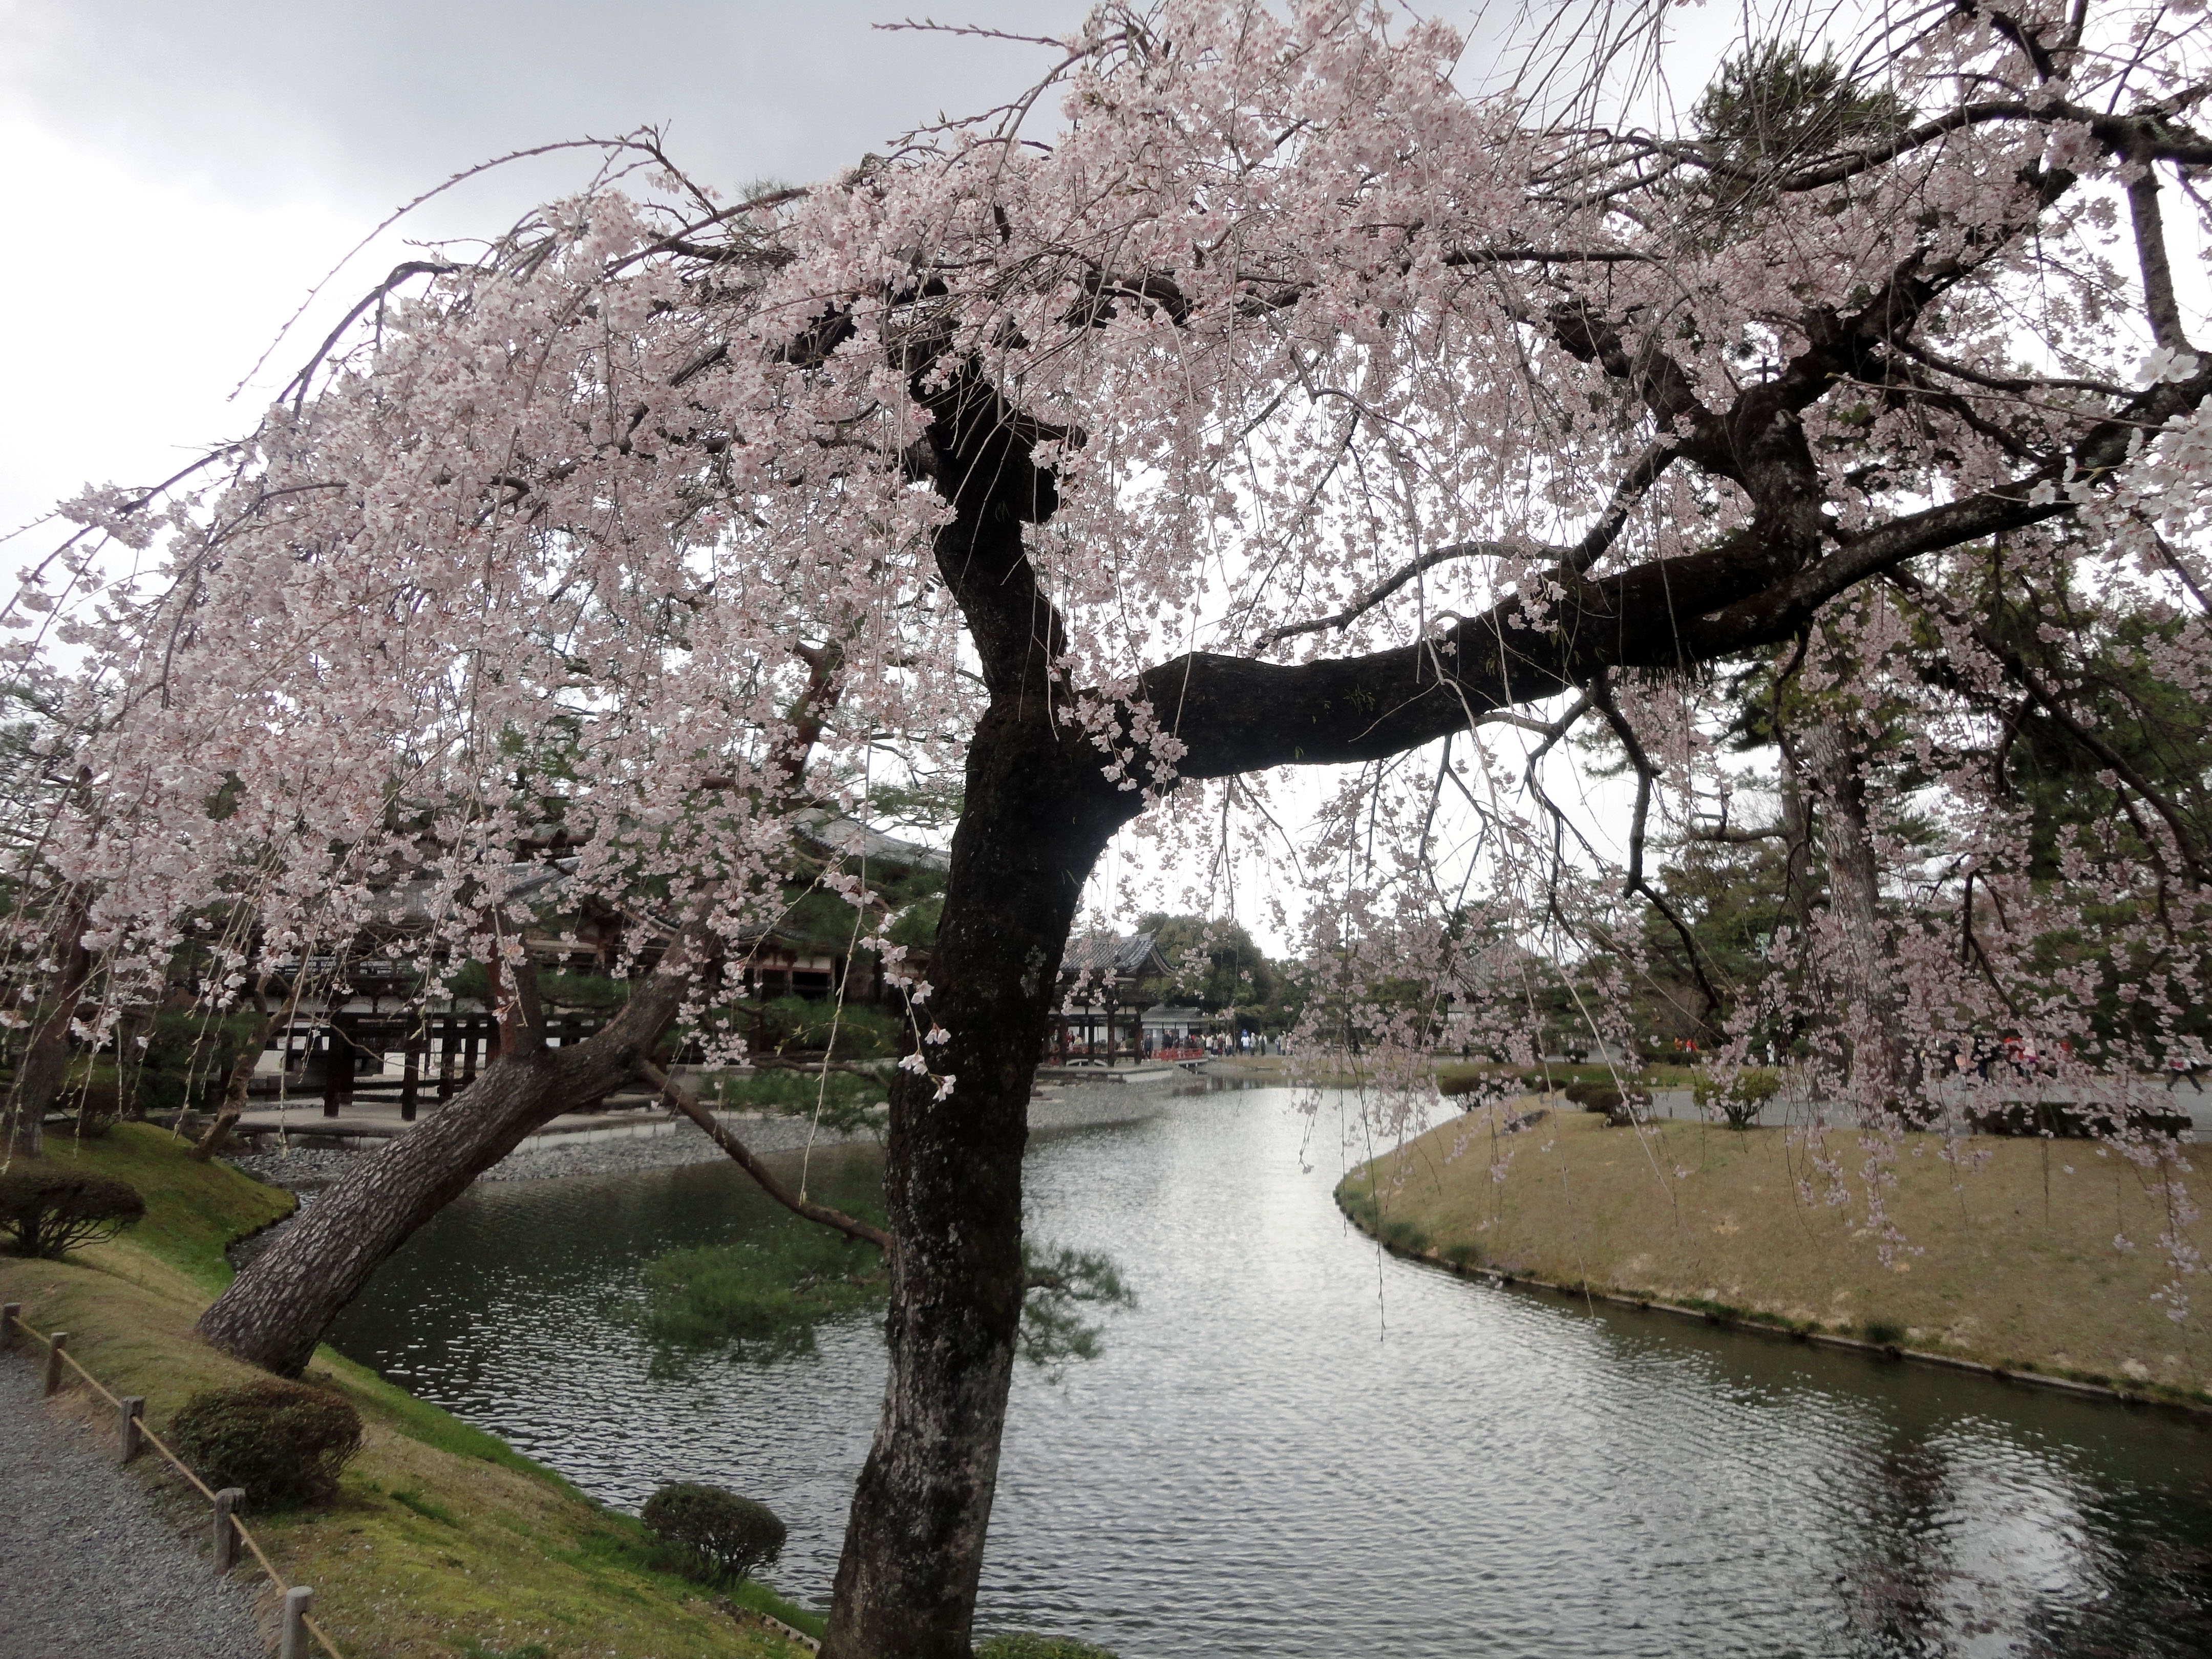 Pink Cherry tree blossoms Byodo in temple Jodo shiki garden Kyoto Japan 02